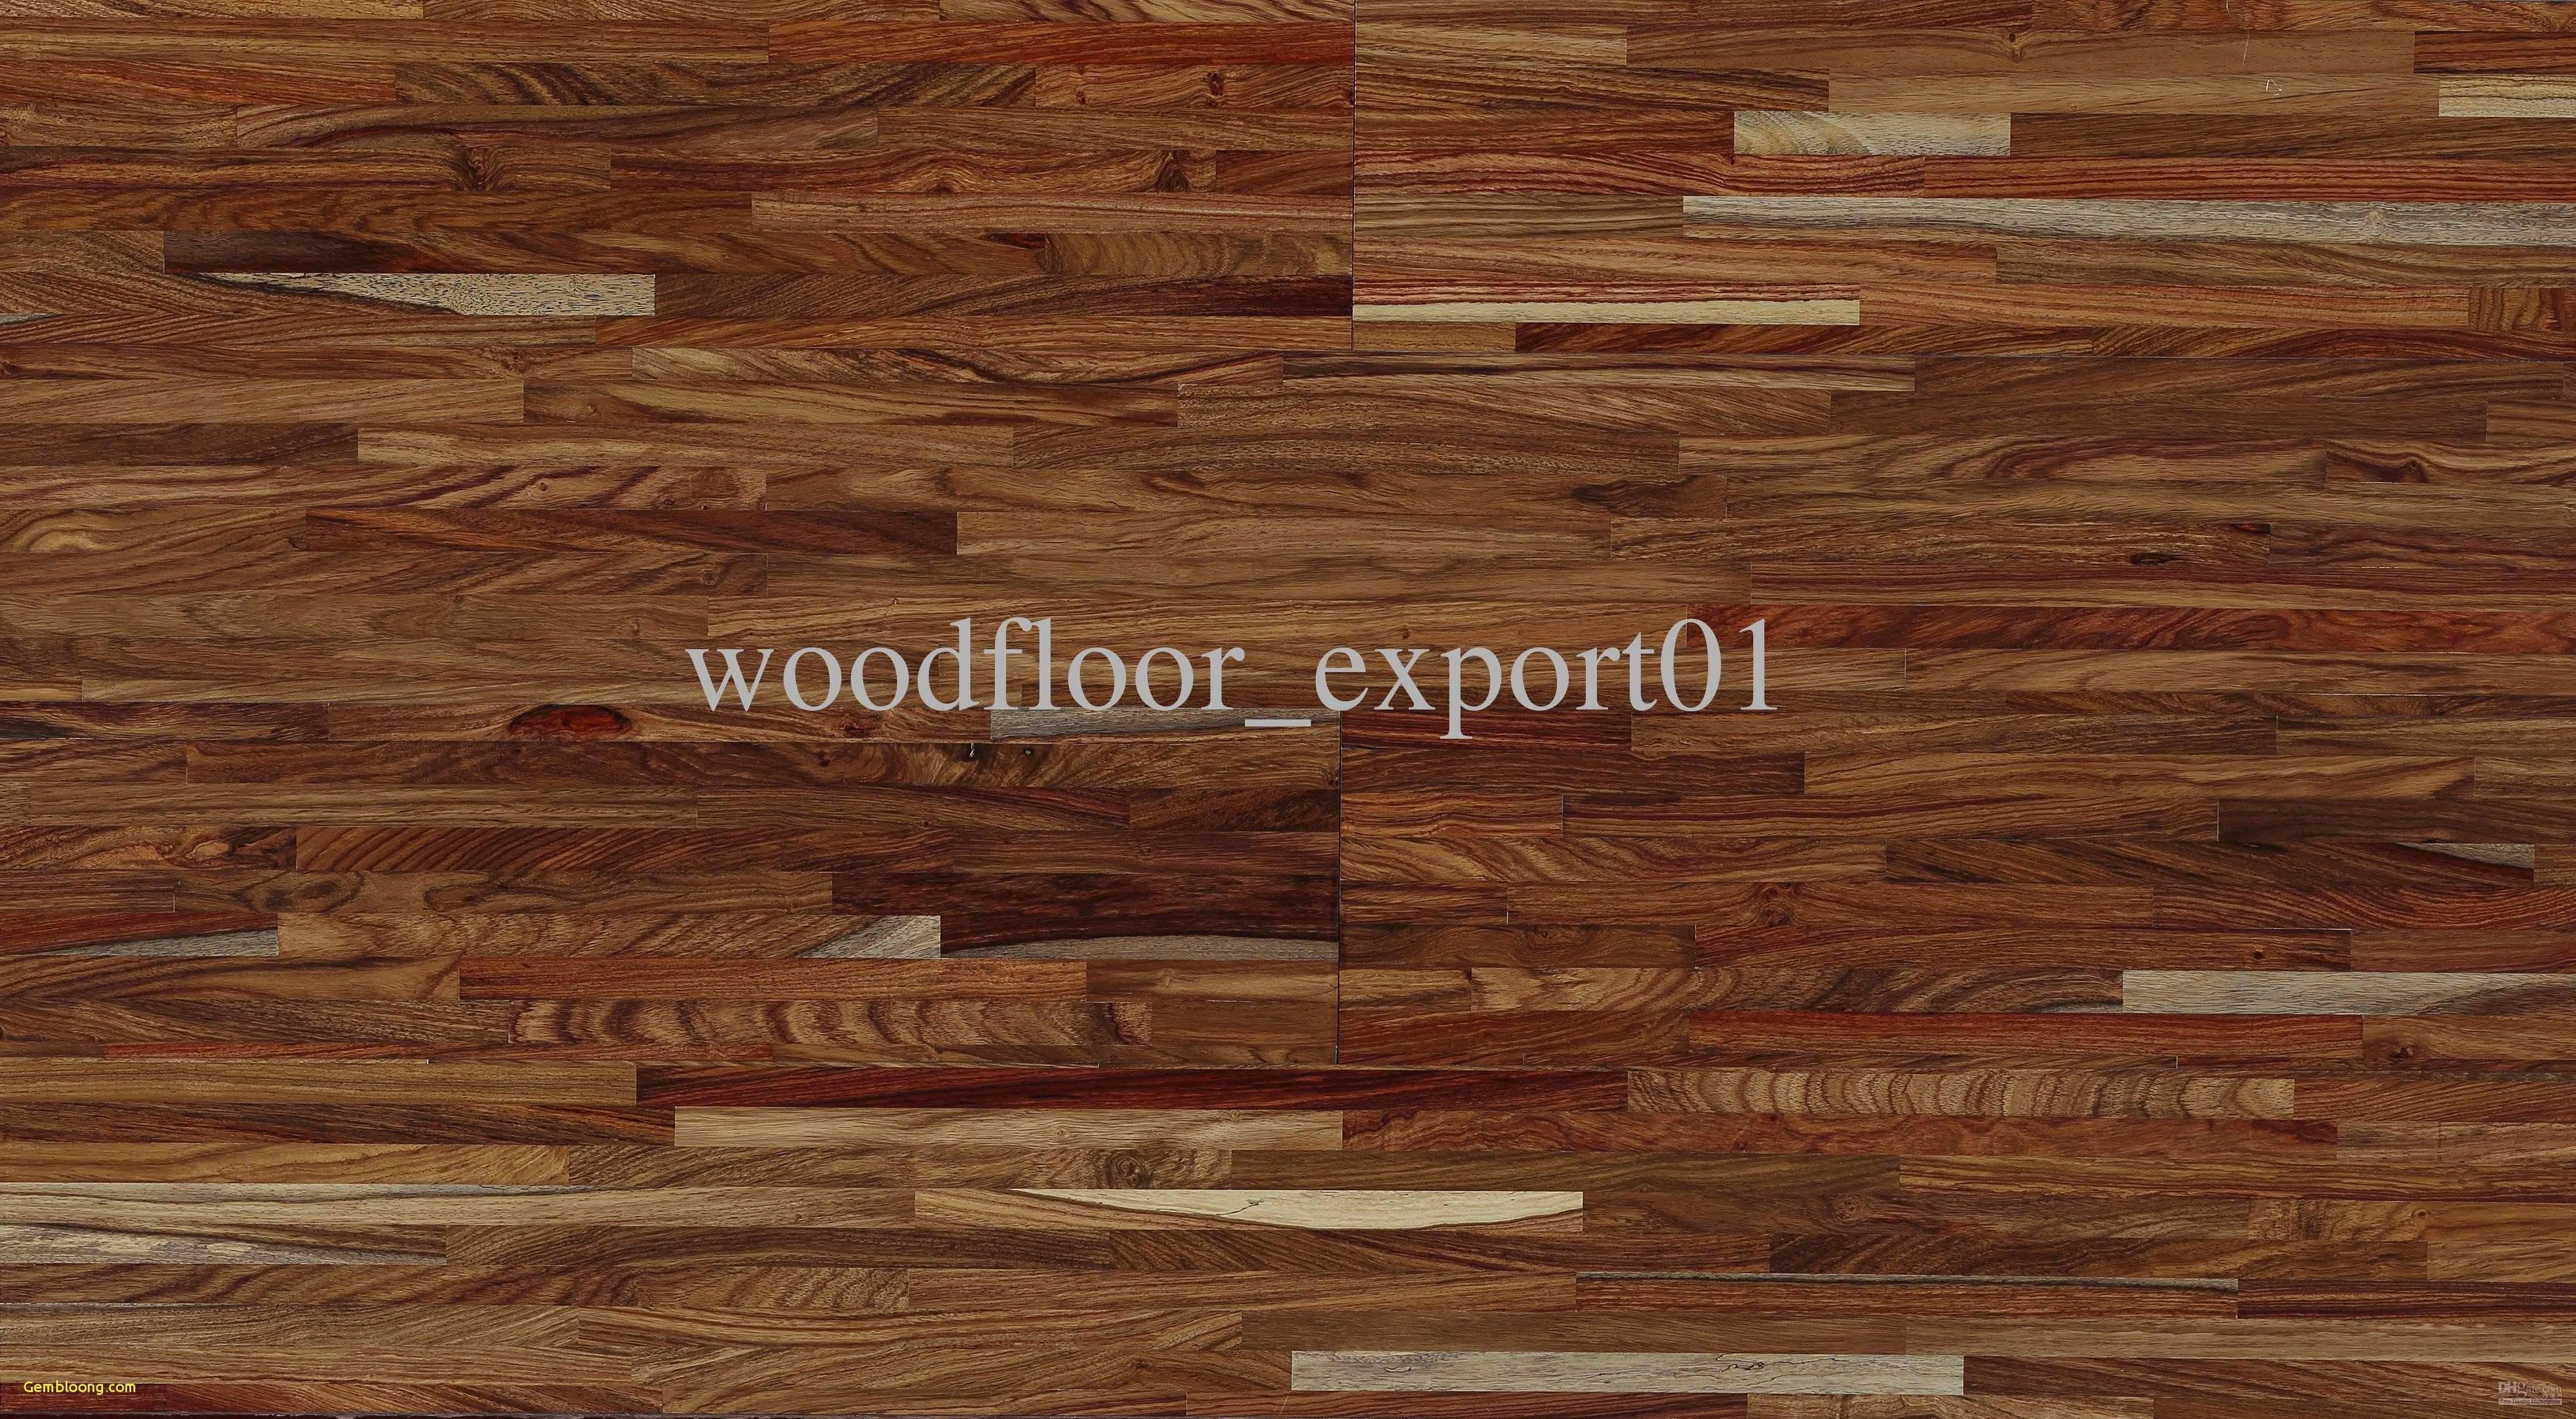 best type of wood for hardwood floors of hardwood flooring designs facesinnature in hardwood flooring designs flooring nj furniture design hard wood flooring new 0d grace place